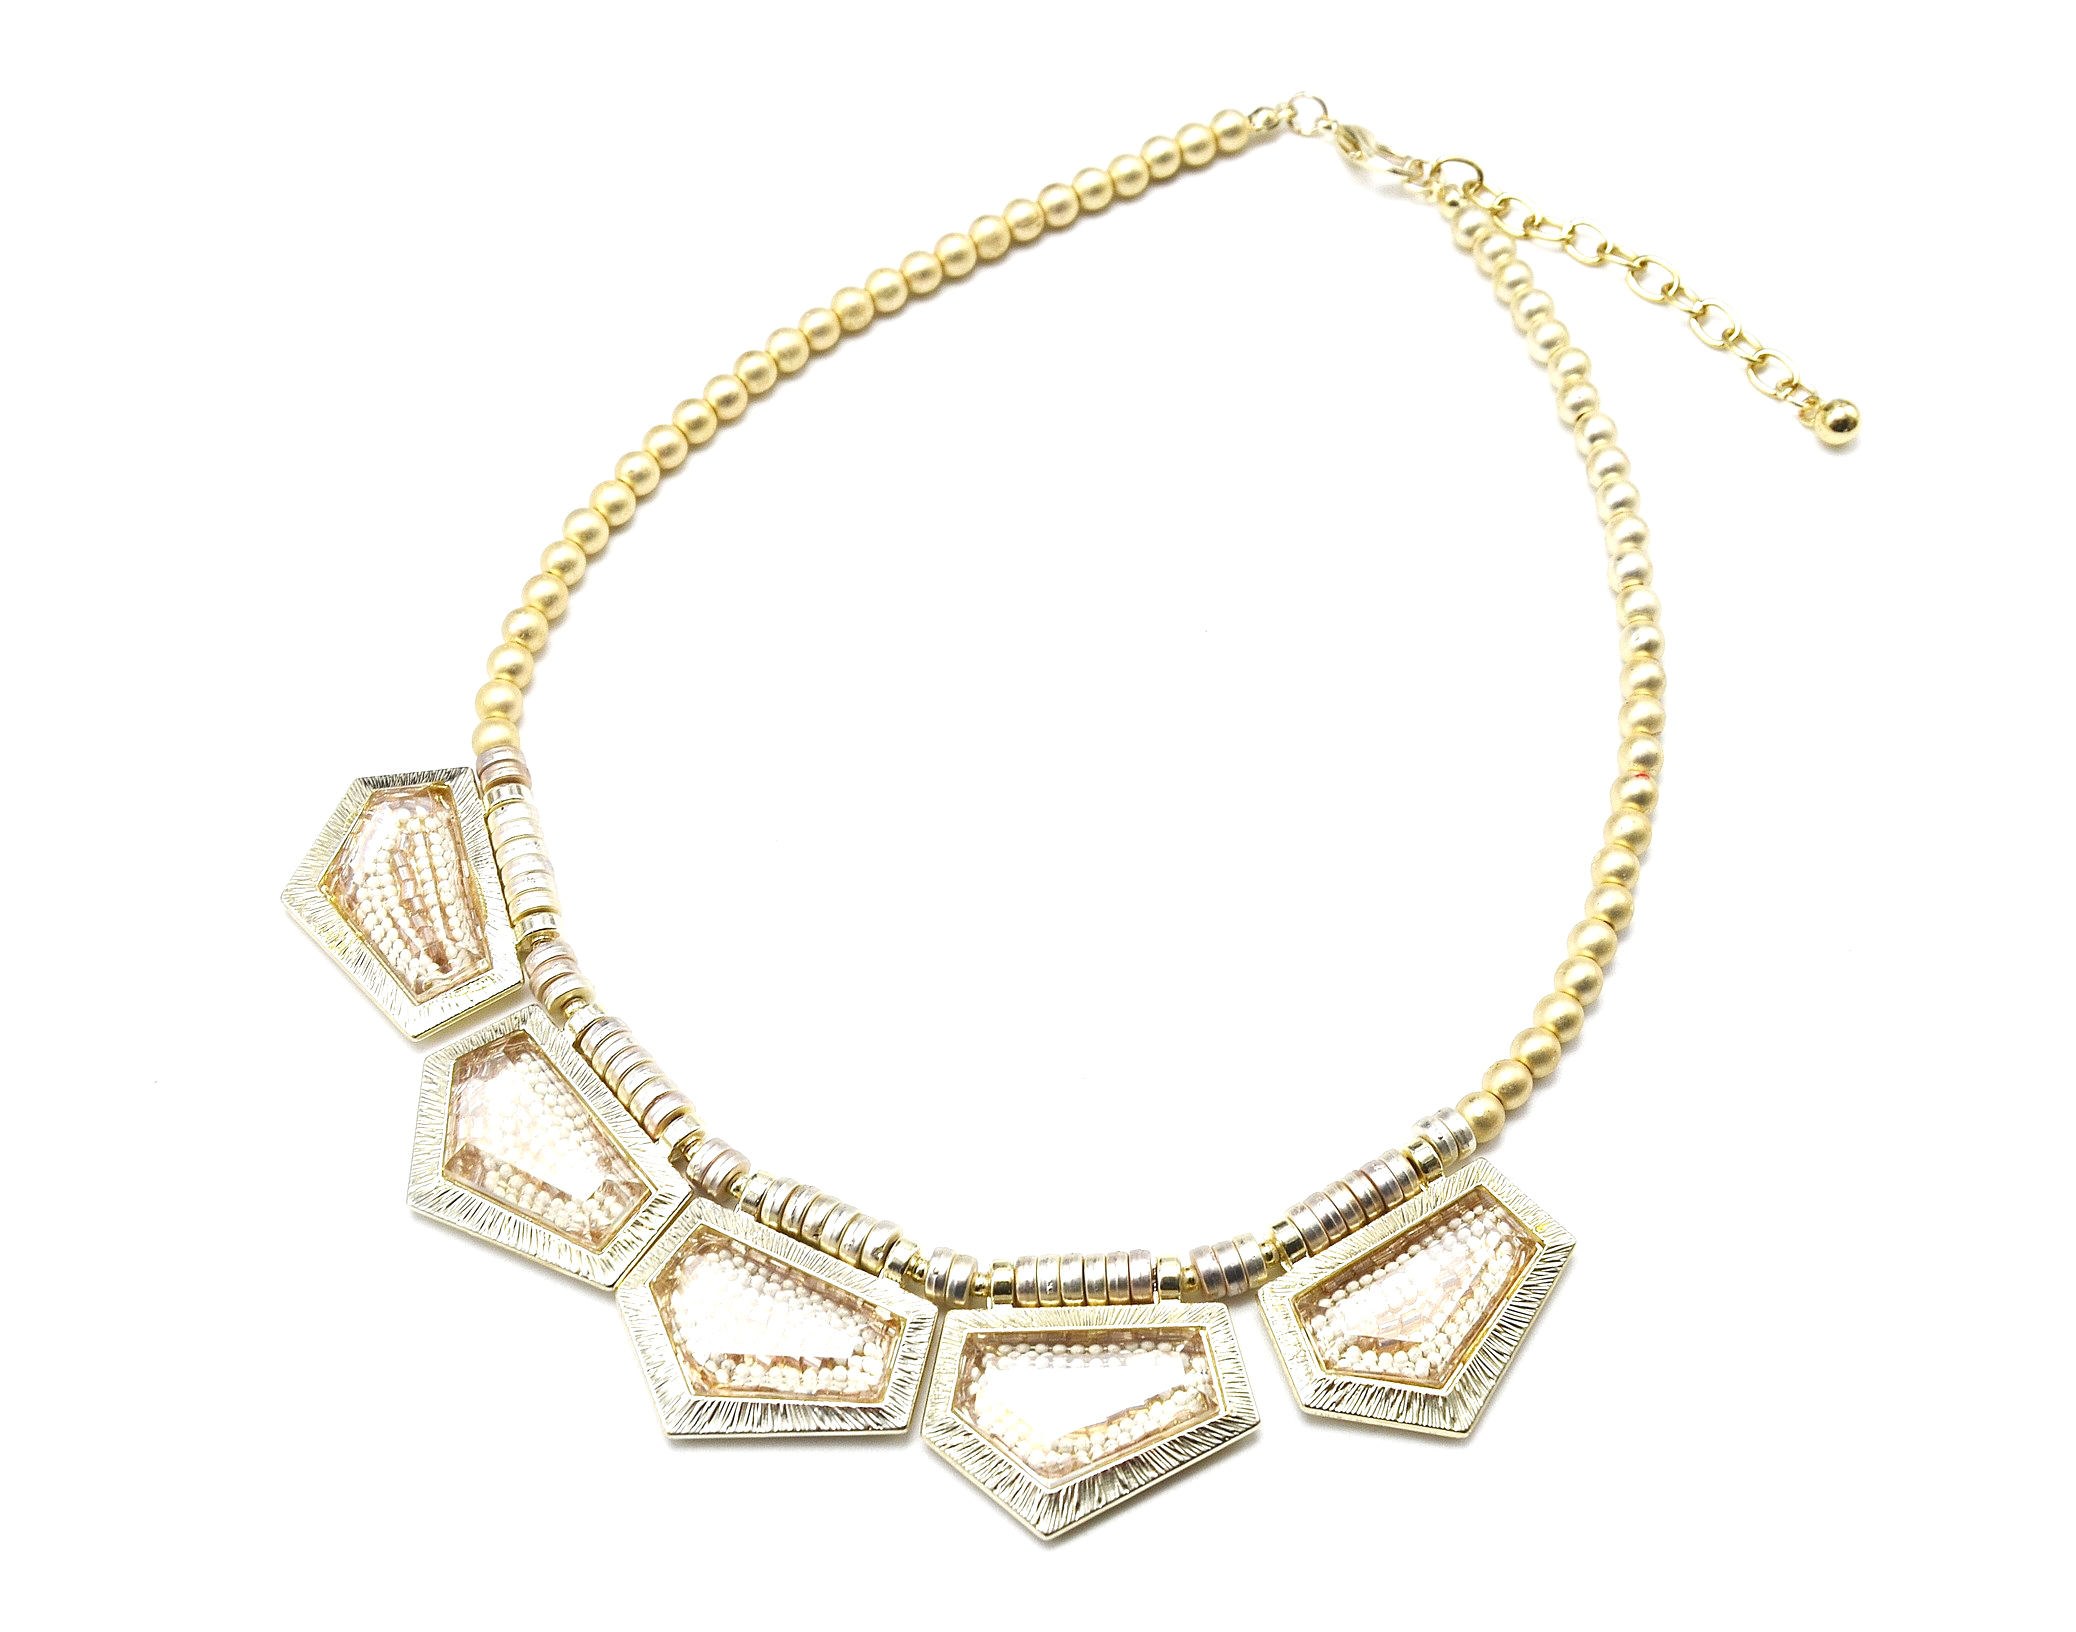 cc795 collier plastron pendentif formes g om tiques avec perles l 39 int rieur beige dor. Black Bedroom Furniture Sets. Home Design Ideas